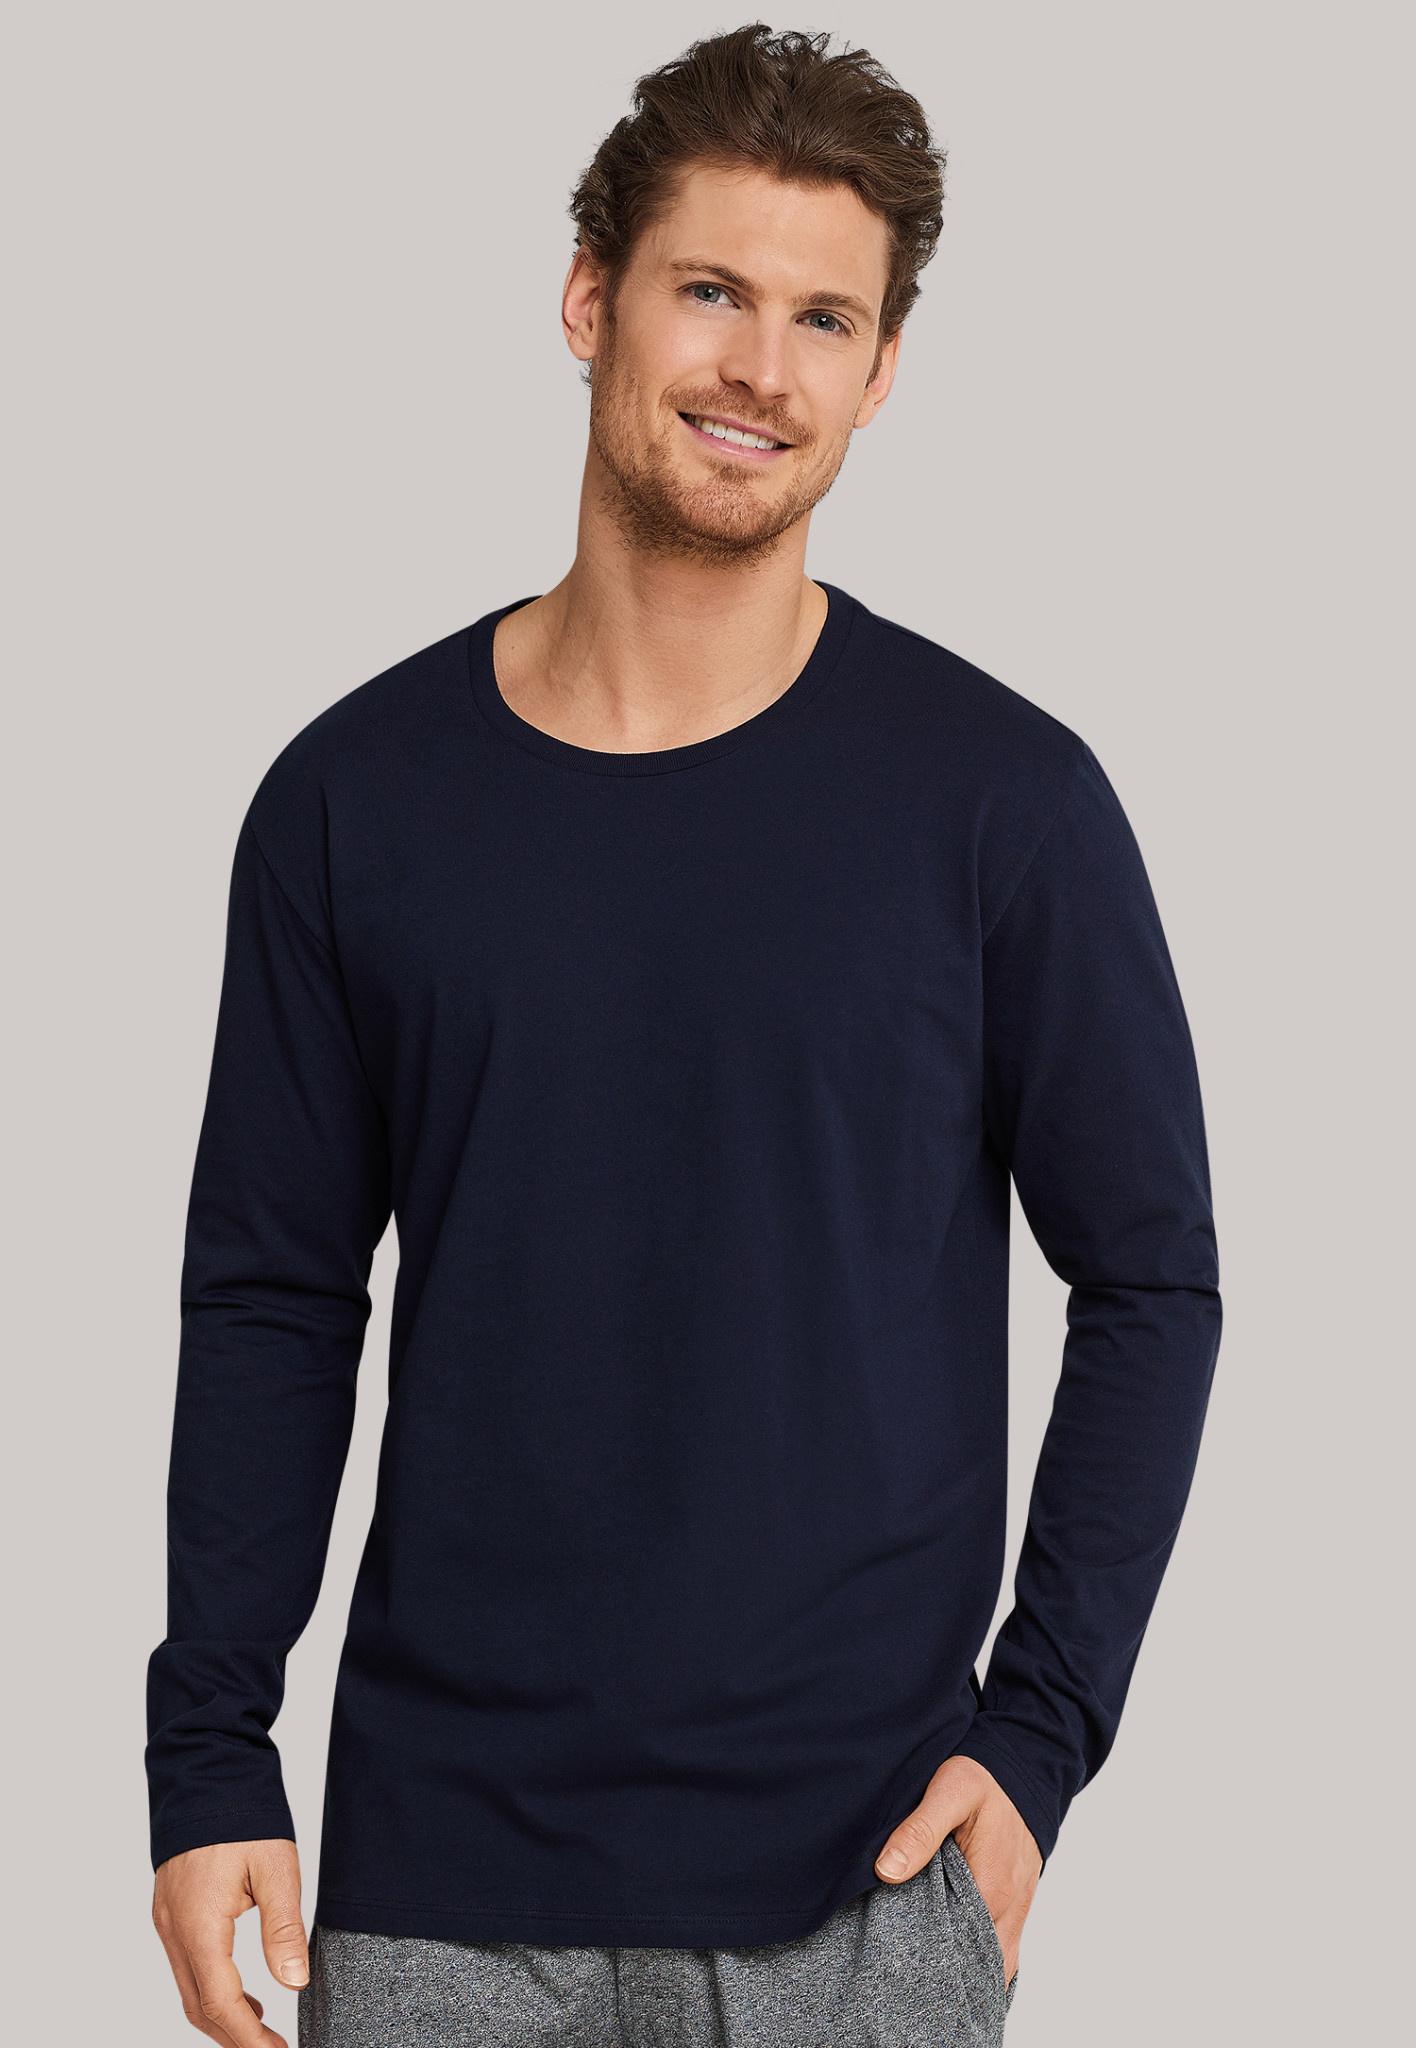 Shirt lange mouw Mix & Match 163835 - donkerblauw-1